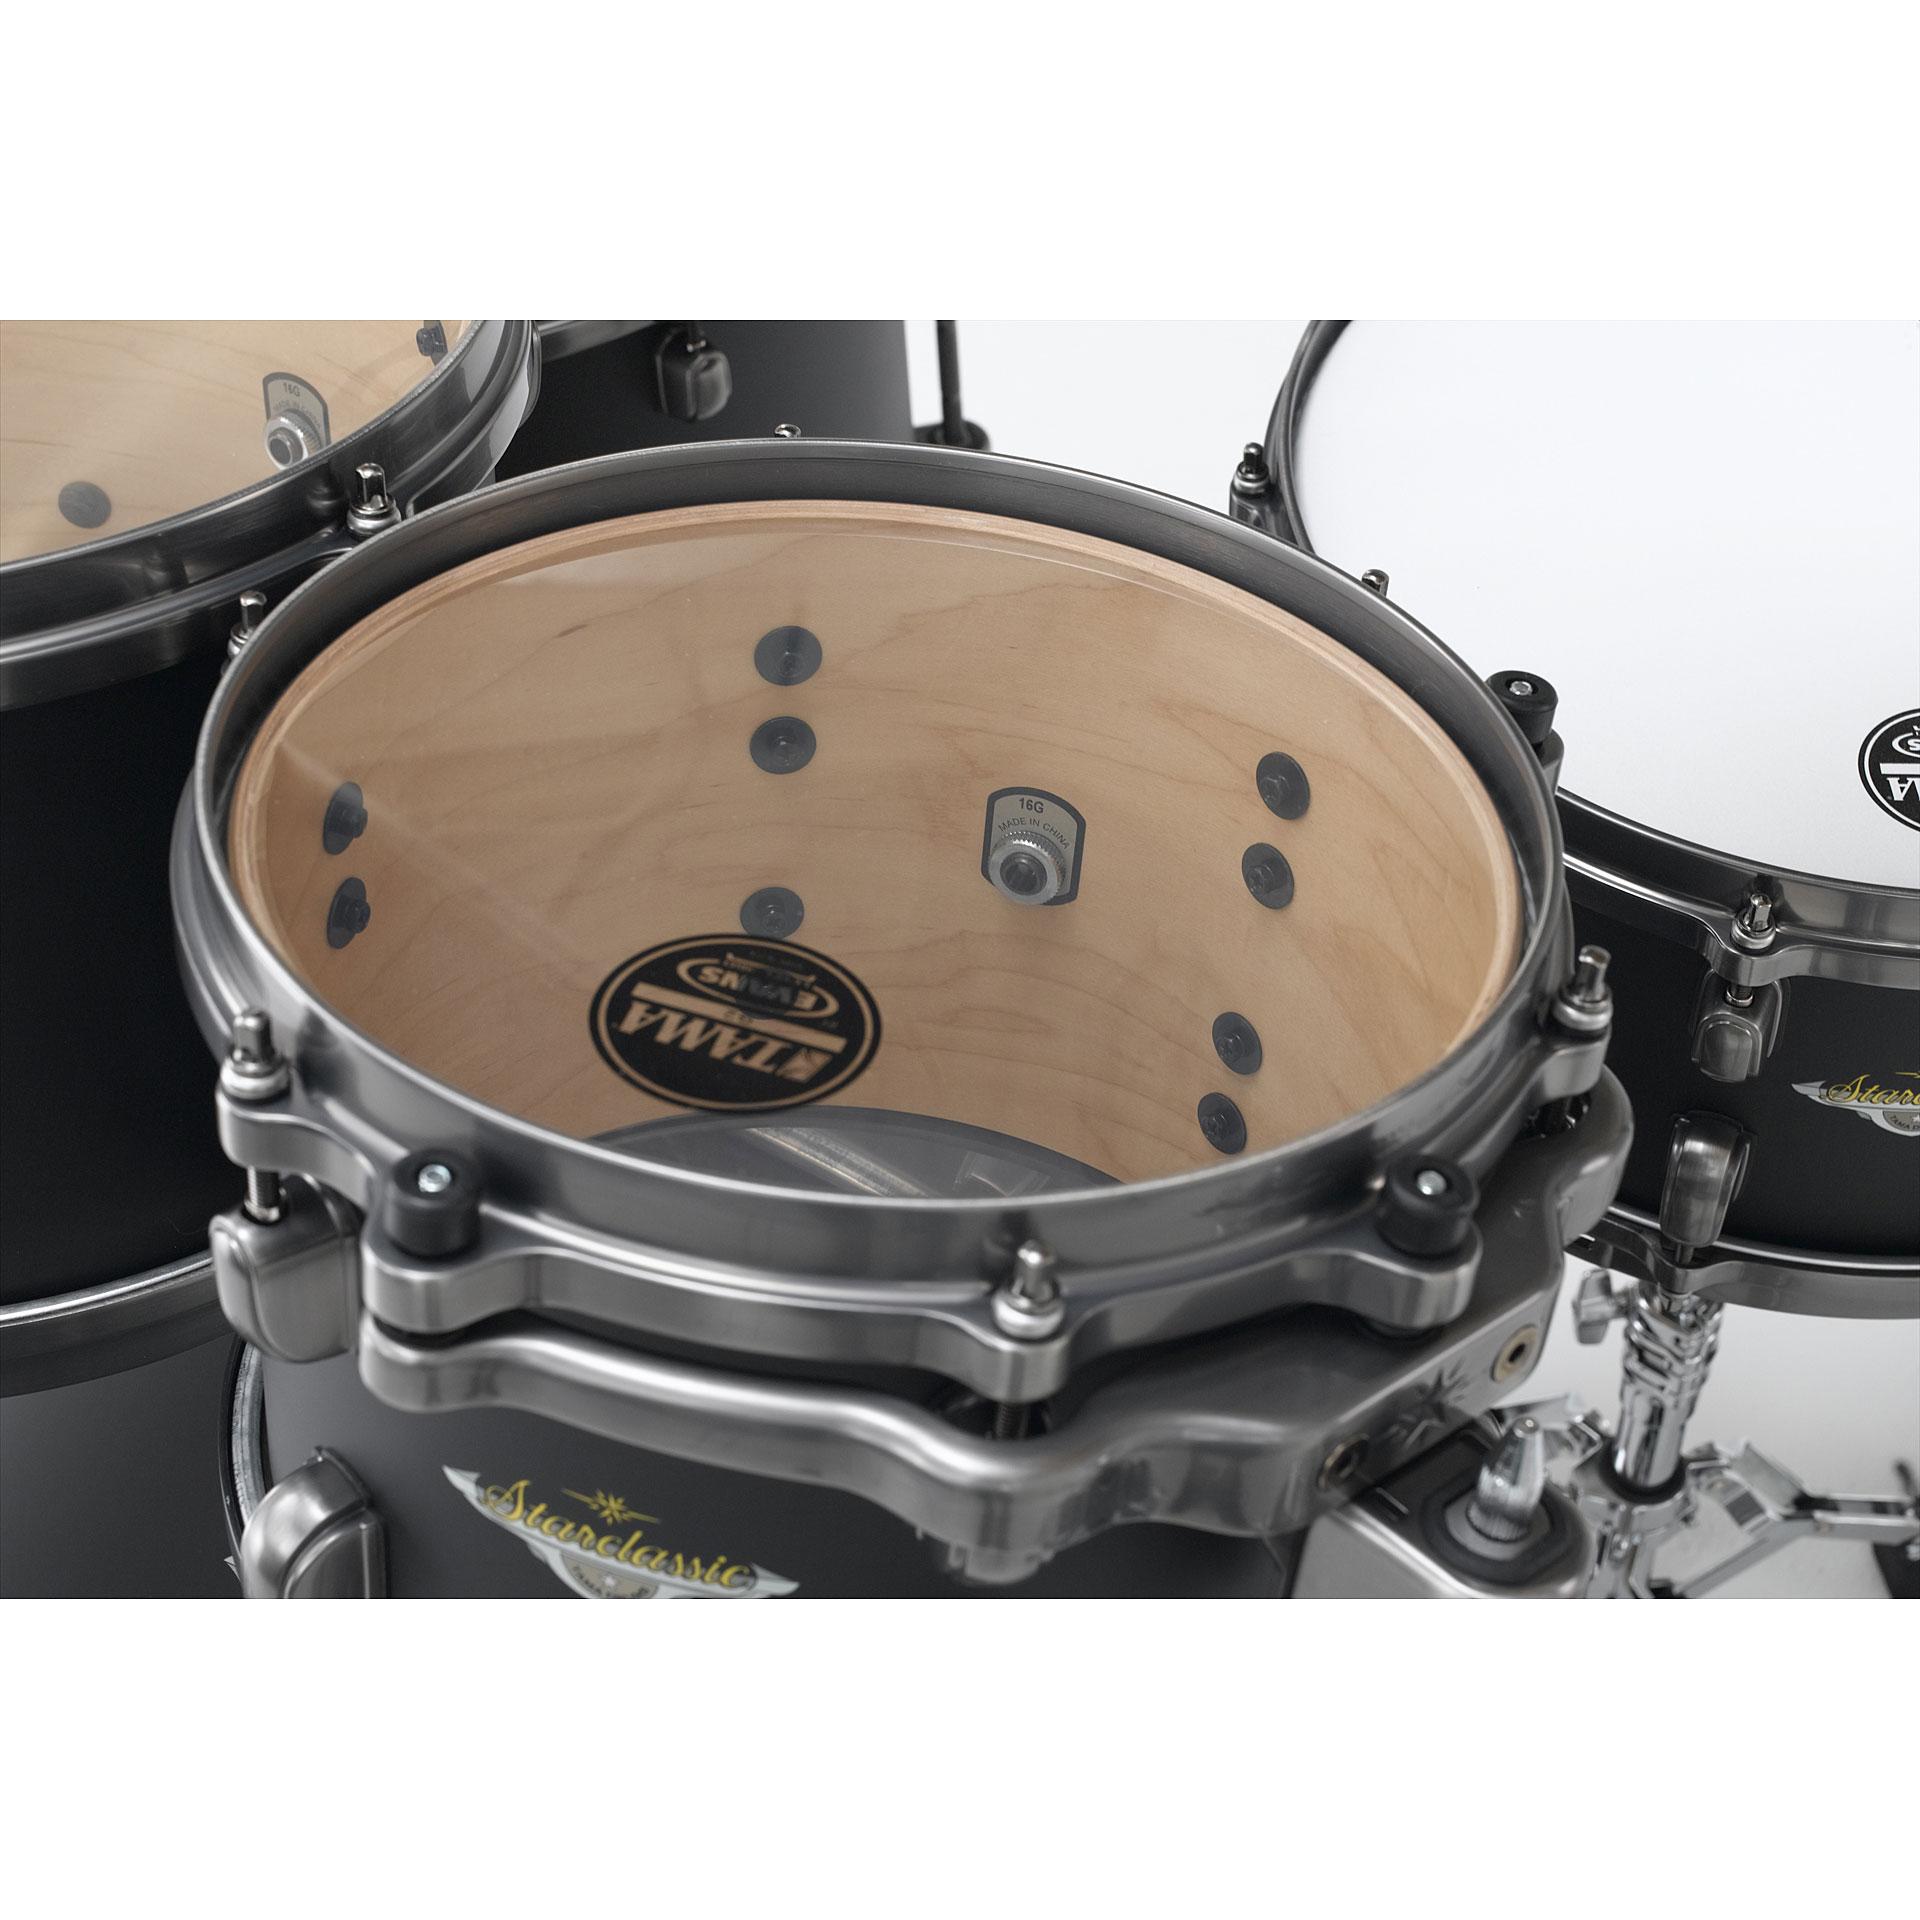 tama starclassic maple 22 flat black drum kit. Black Bedroom Furniture Sets. Home Design Ideas